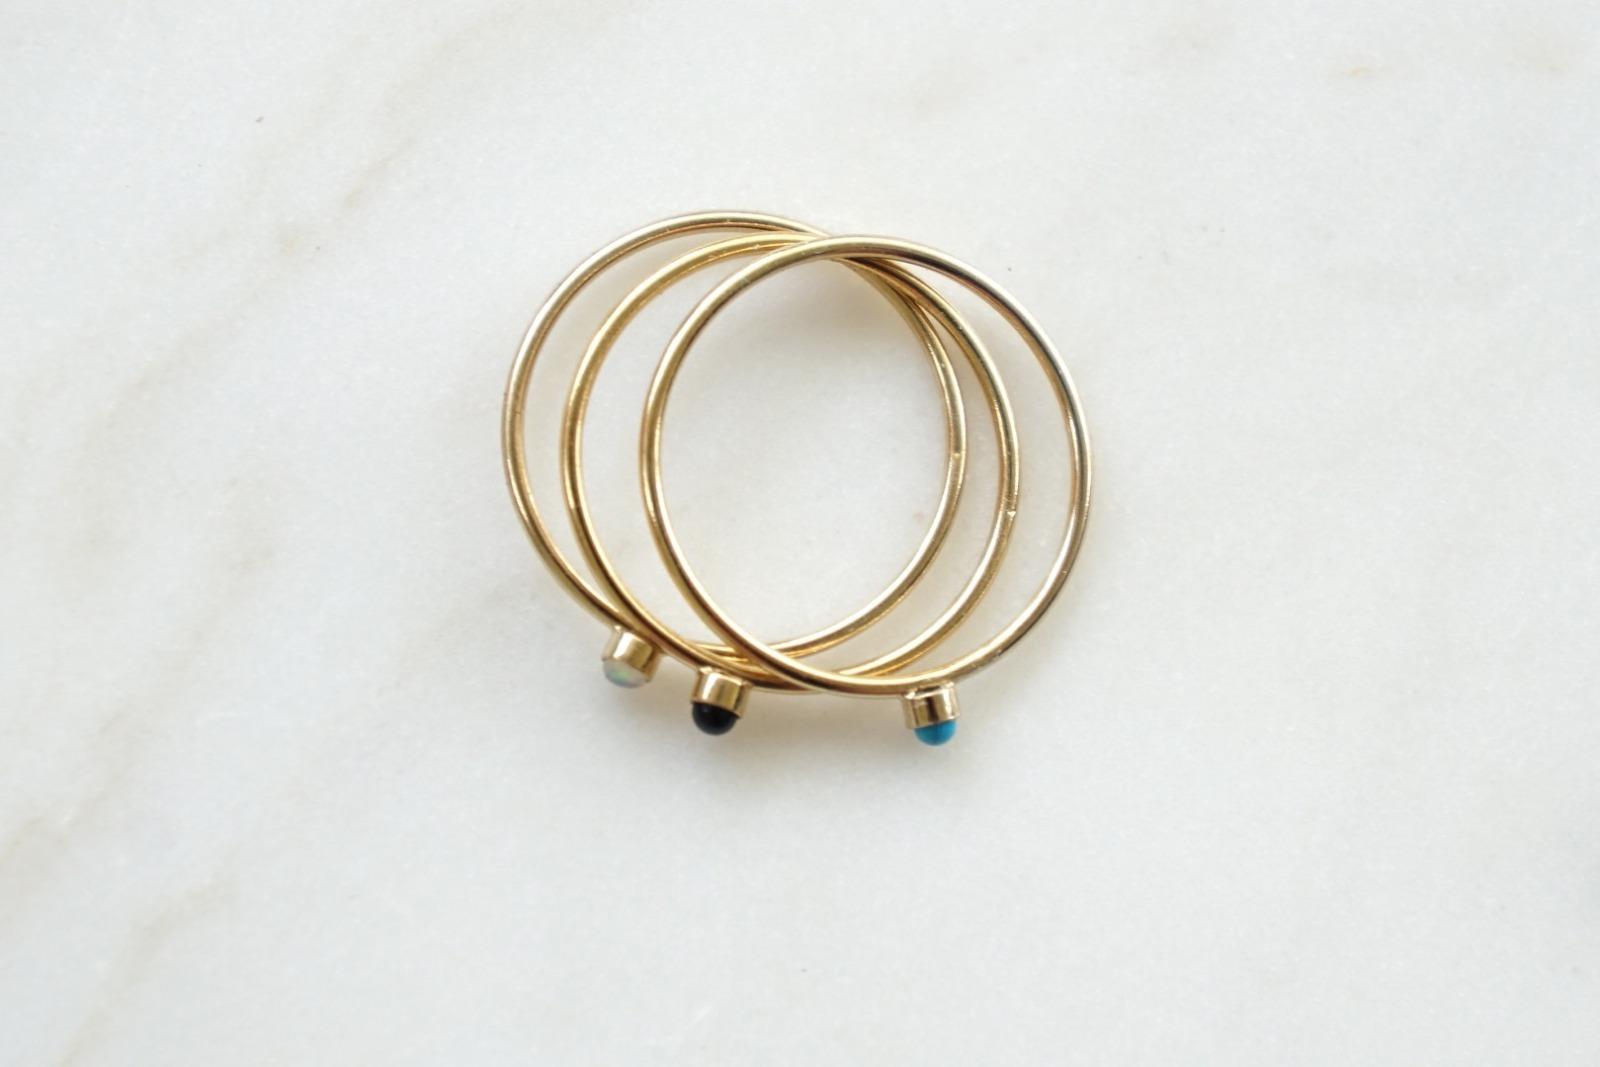 Zierlicher Ring Stapelring vergoldet Rosa Opal - 3